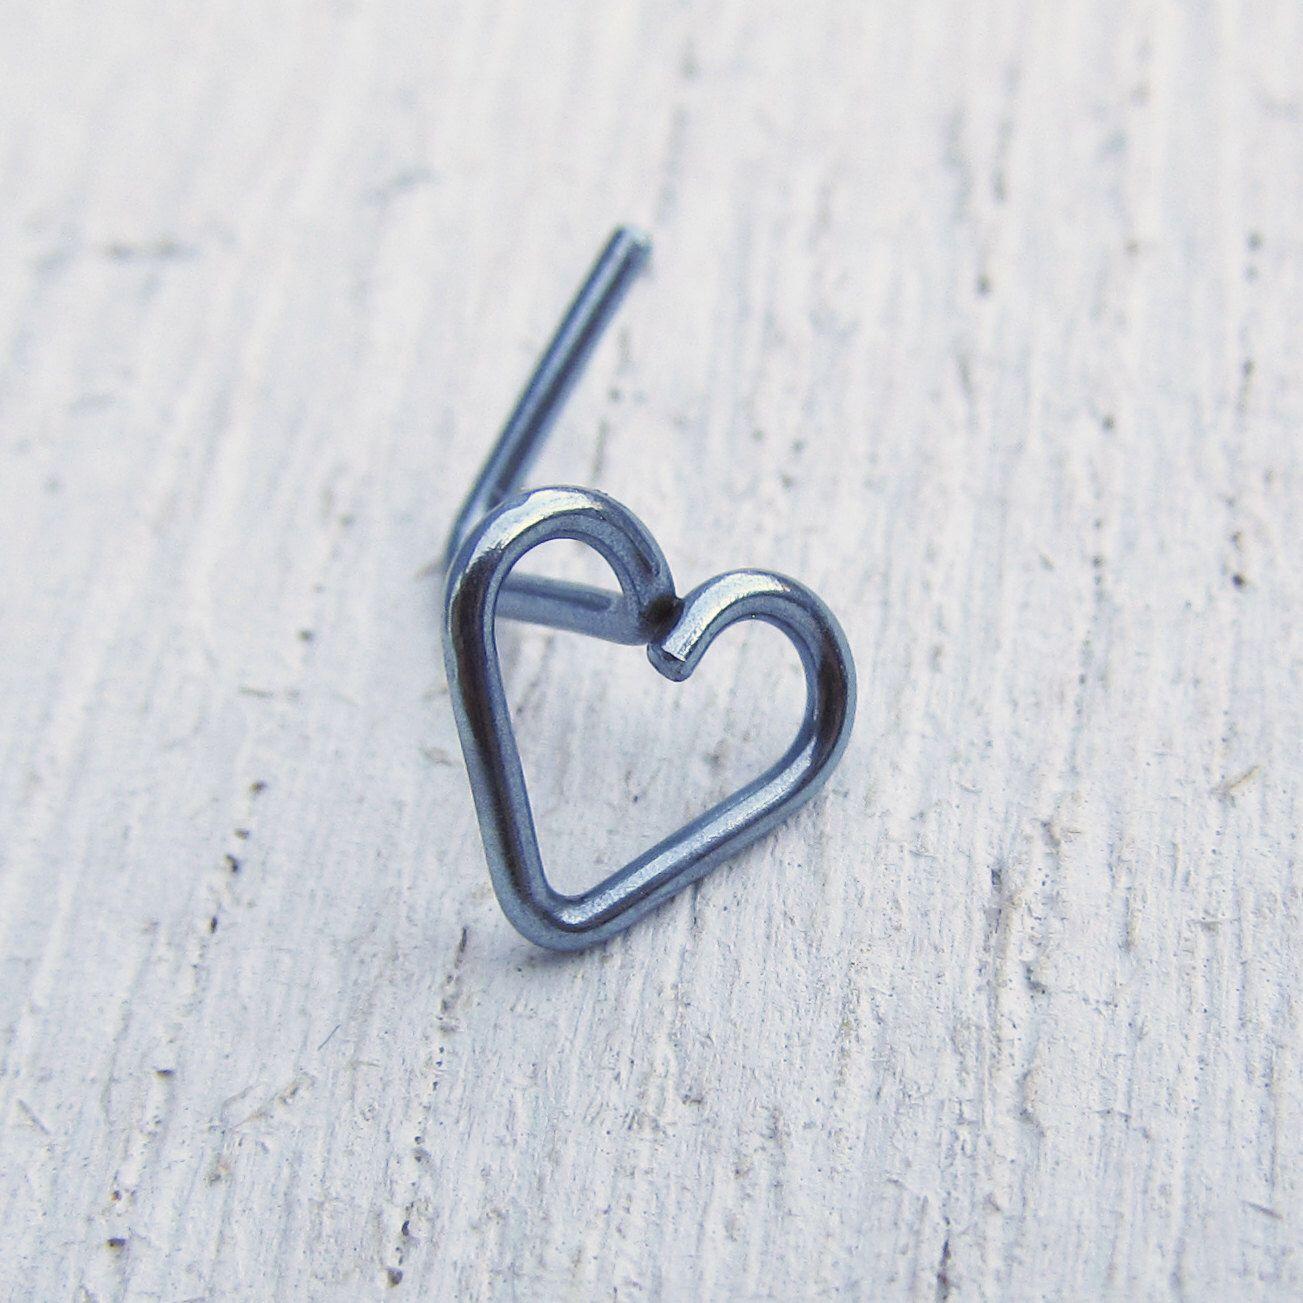 Nose piercing kit   Gauge Niobium Nose Stud  LBend Nose Stud  Heart Piercing